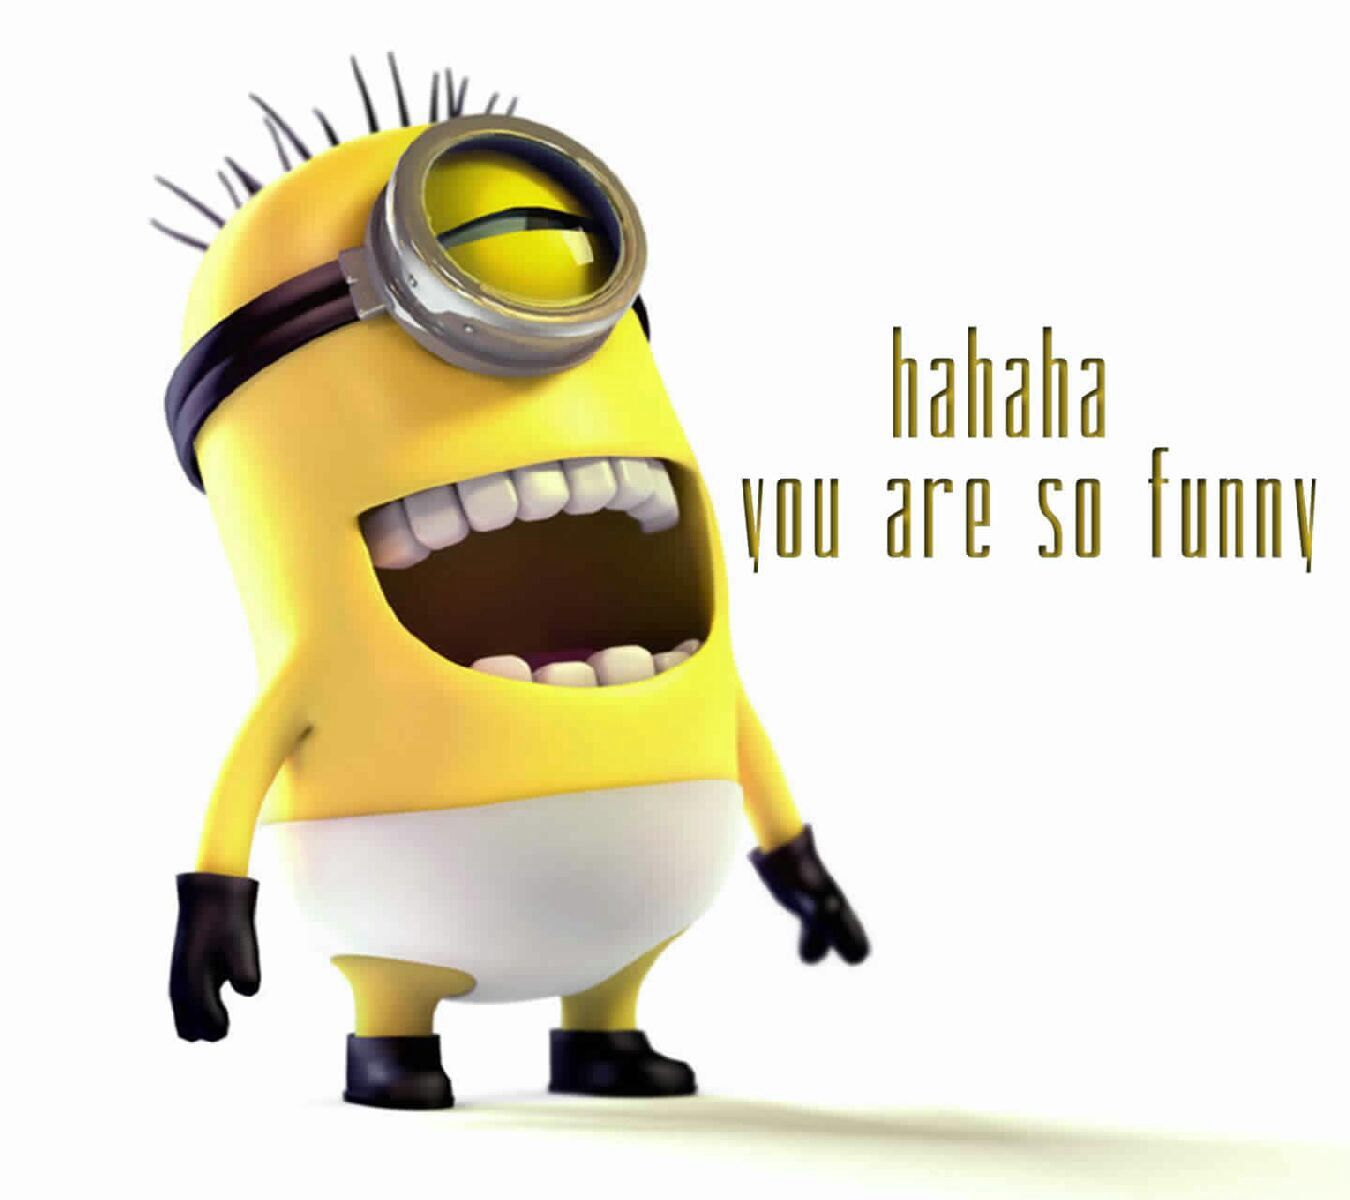 Minion haha you are so funny minions pinterest - Minions funny images ...